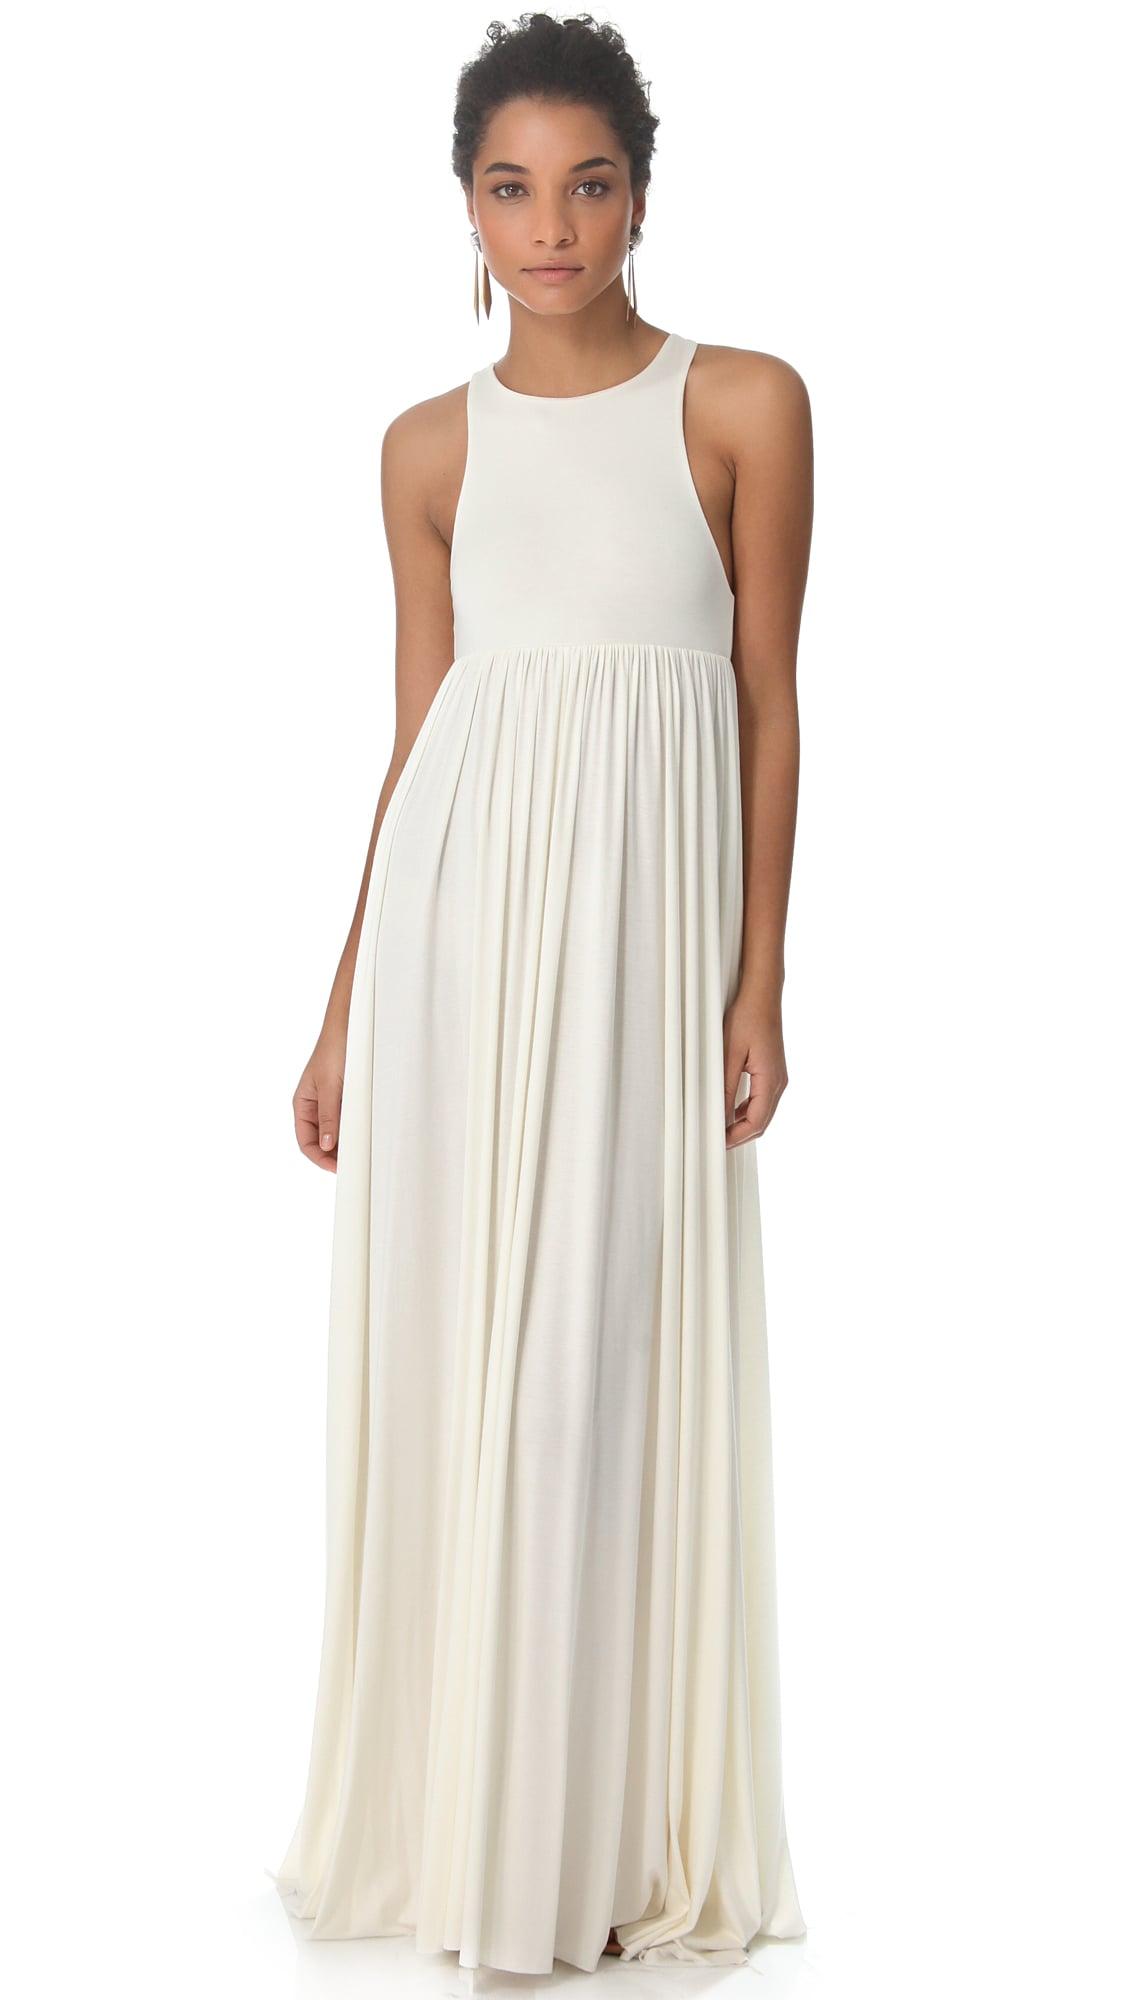 Rachel Pally White Maxi Dress